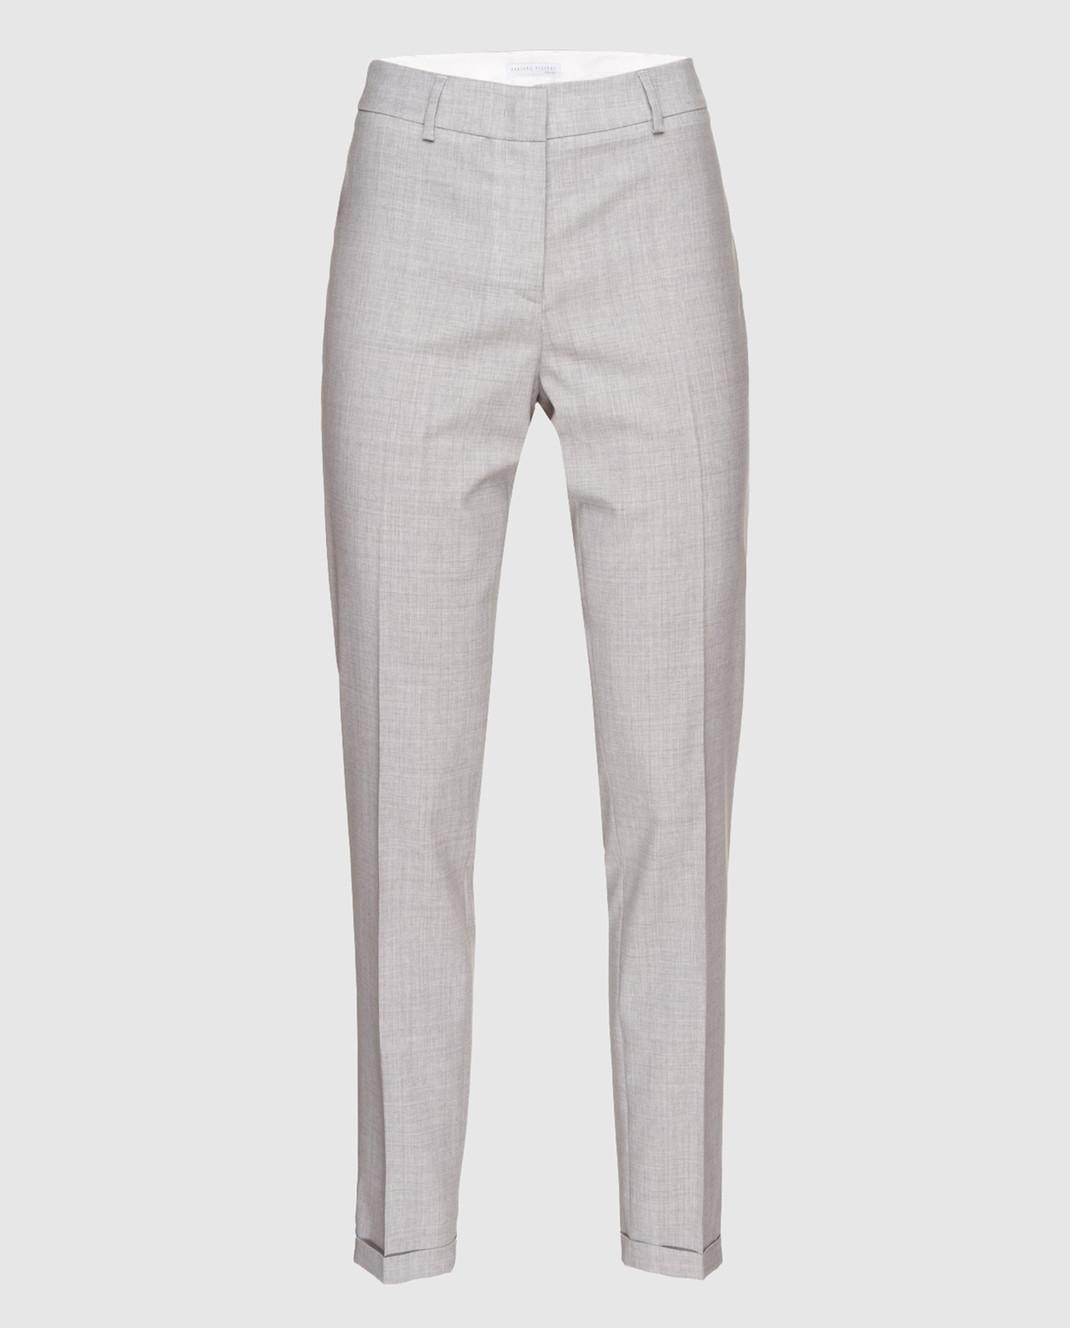 Fabiana Filippi Серые брюки из шерсти PG70118